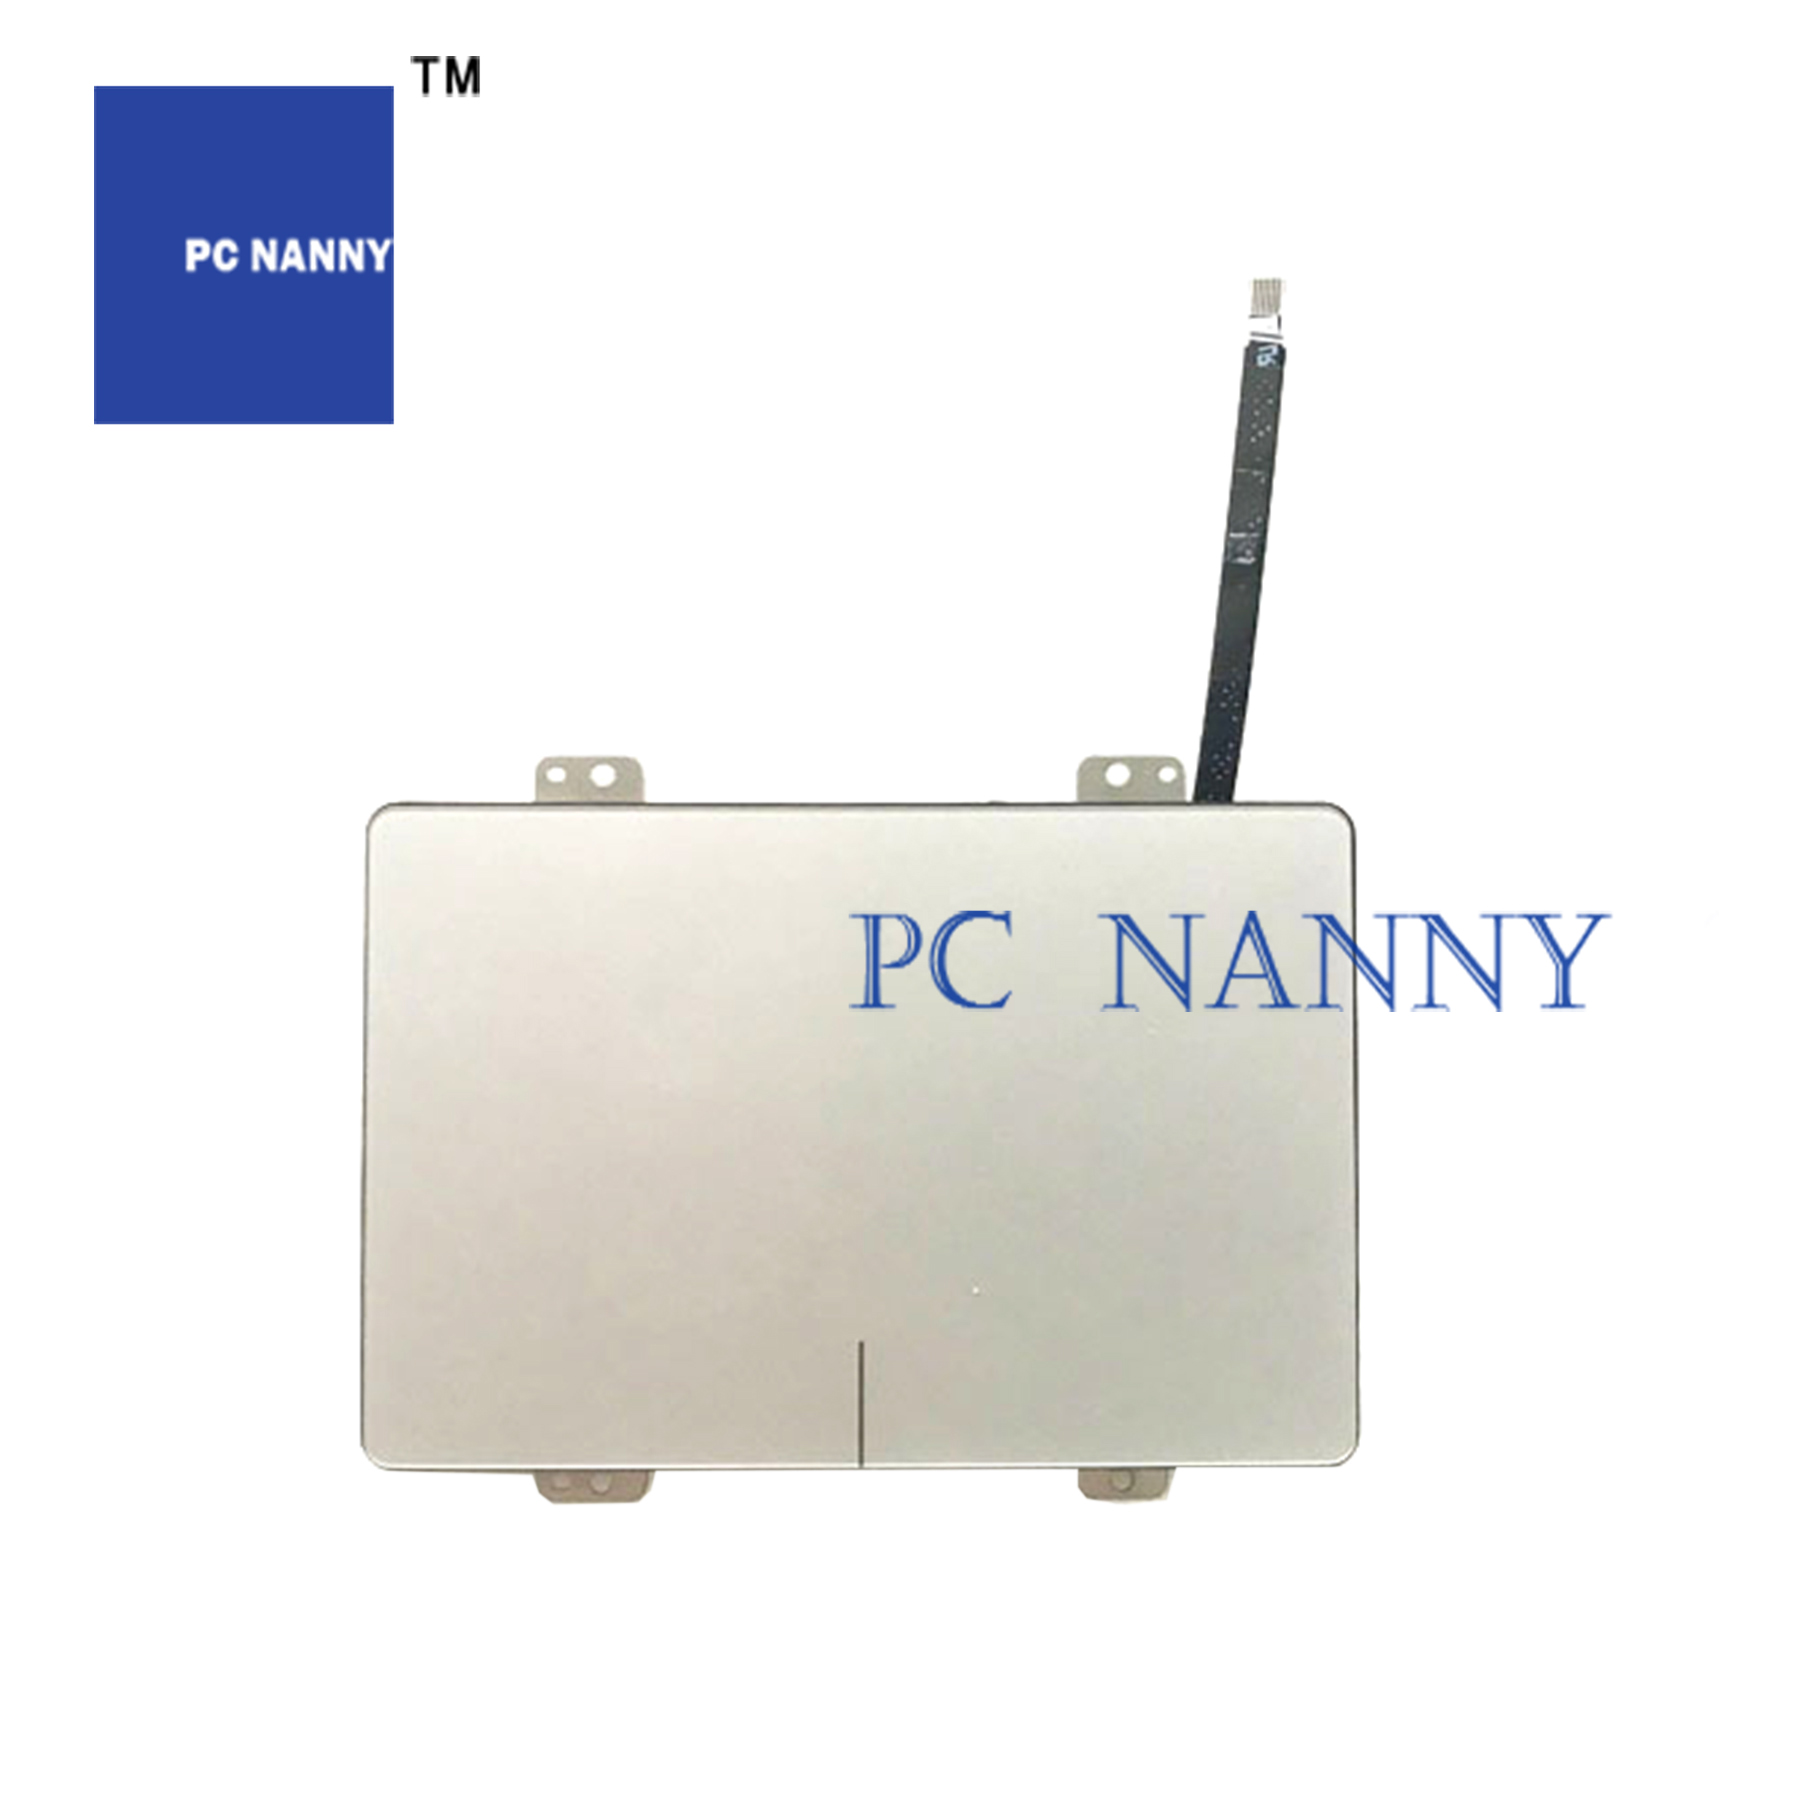 PCNANNY FOR  Lenovo Yoga 920 920-13ikb Touchpad PK09000GT10  Test Good